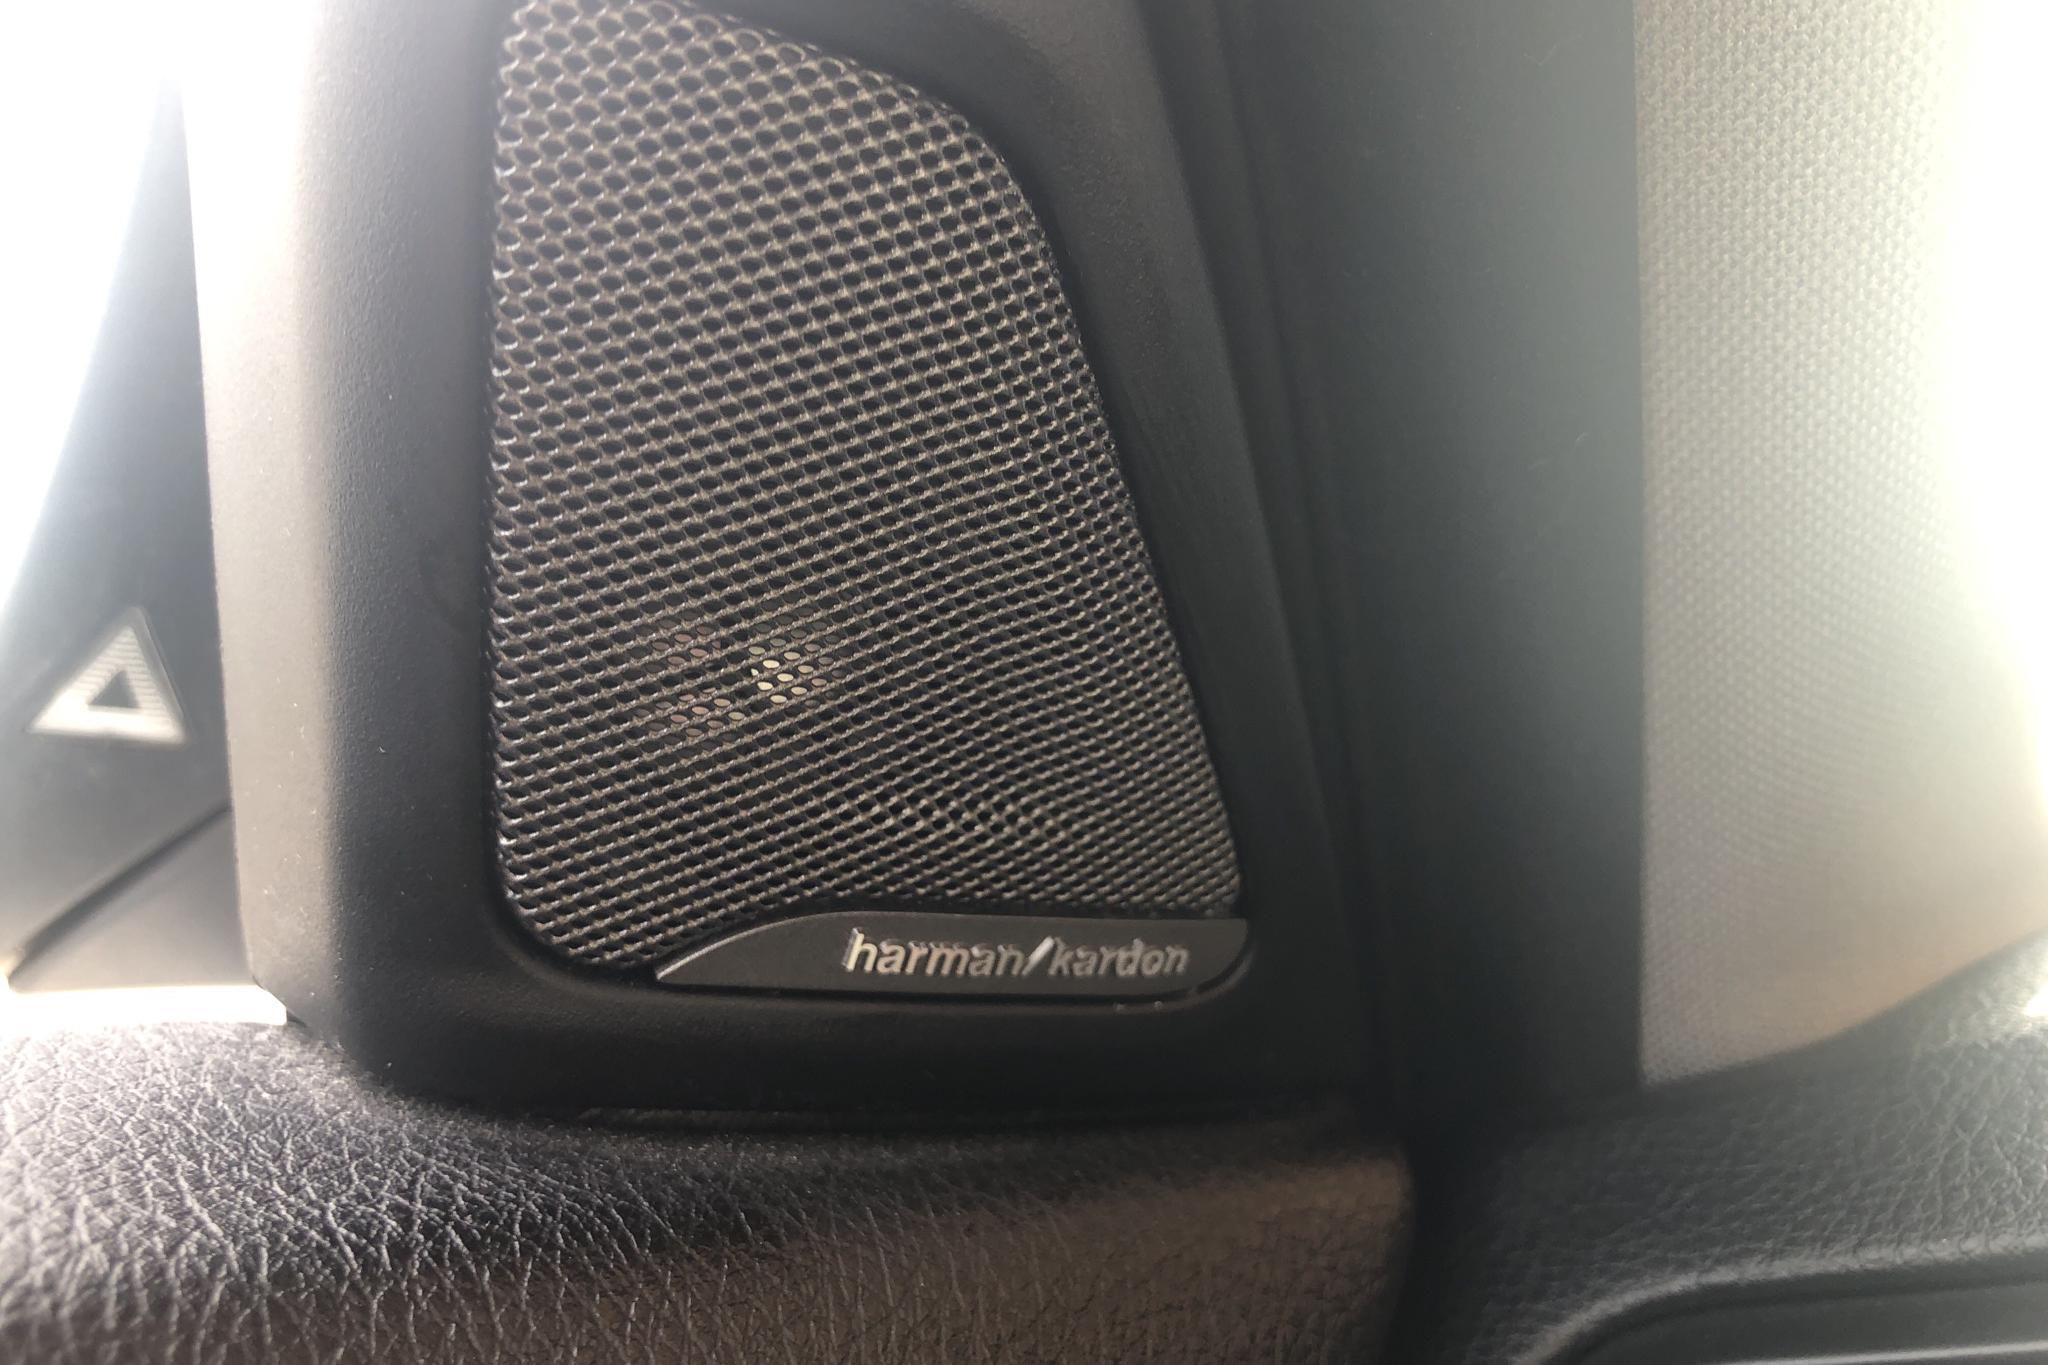 BMW 520d xDrive Touring, F11 (190hk) - 13 874 mil - Automat - vit - 2016